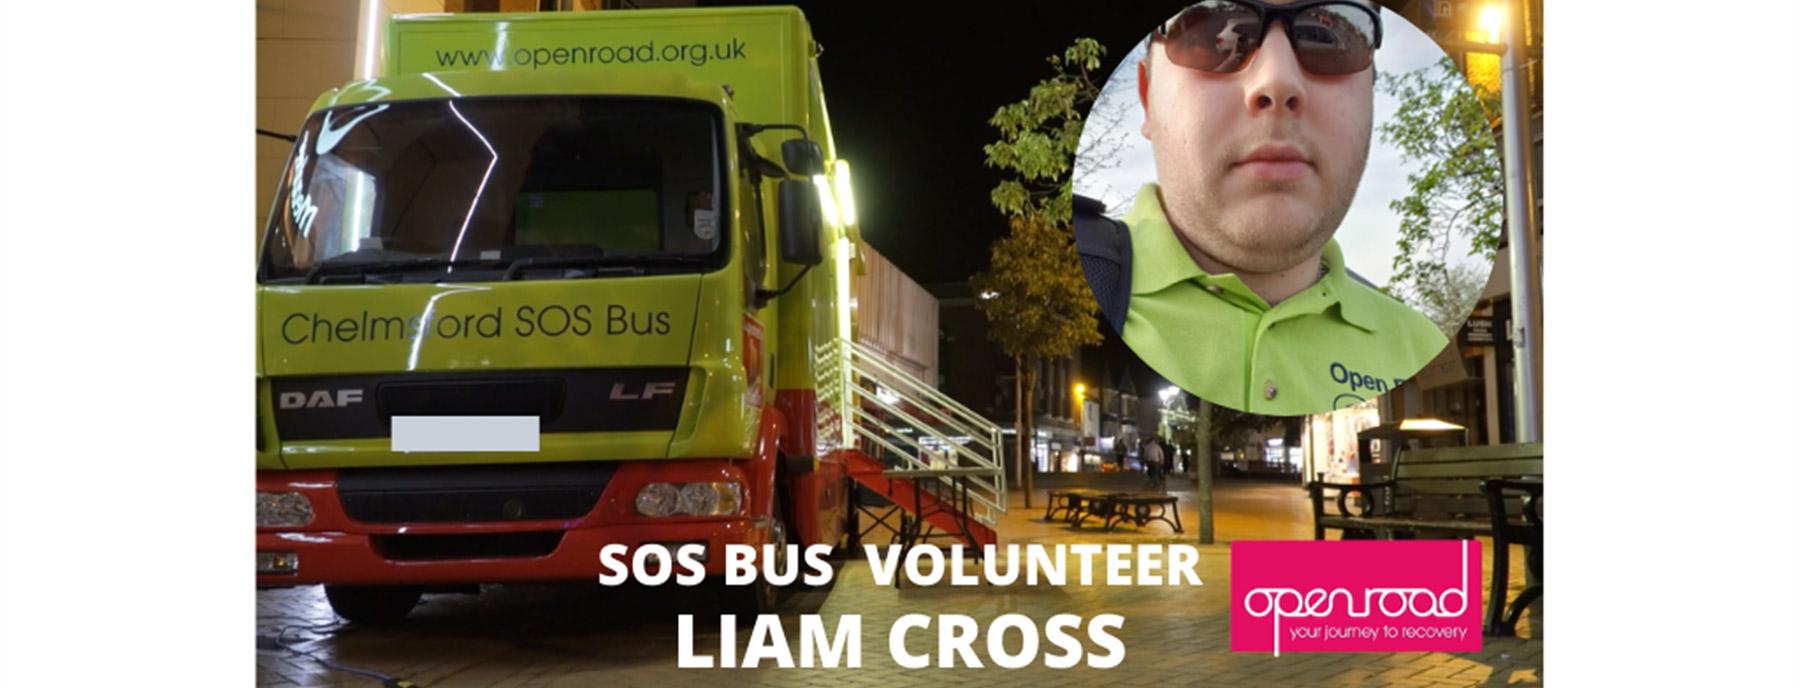 Liam Cross